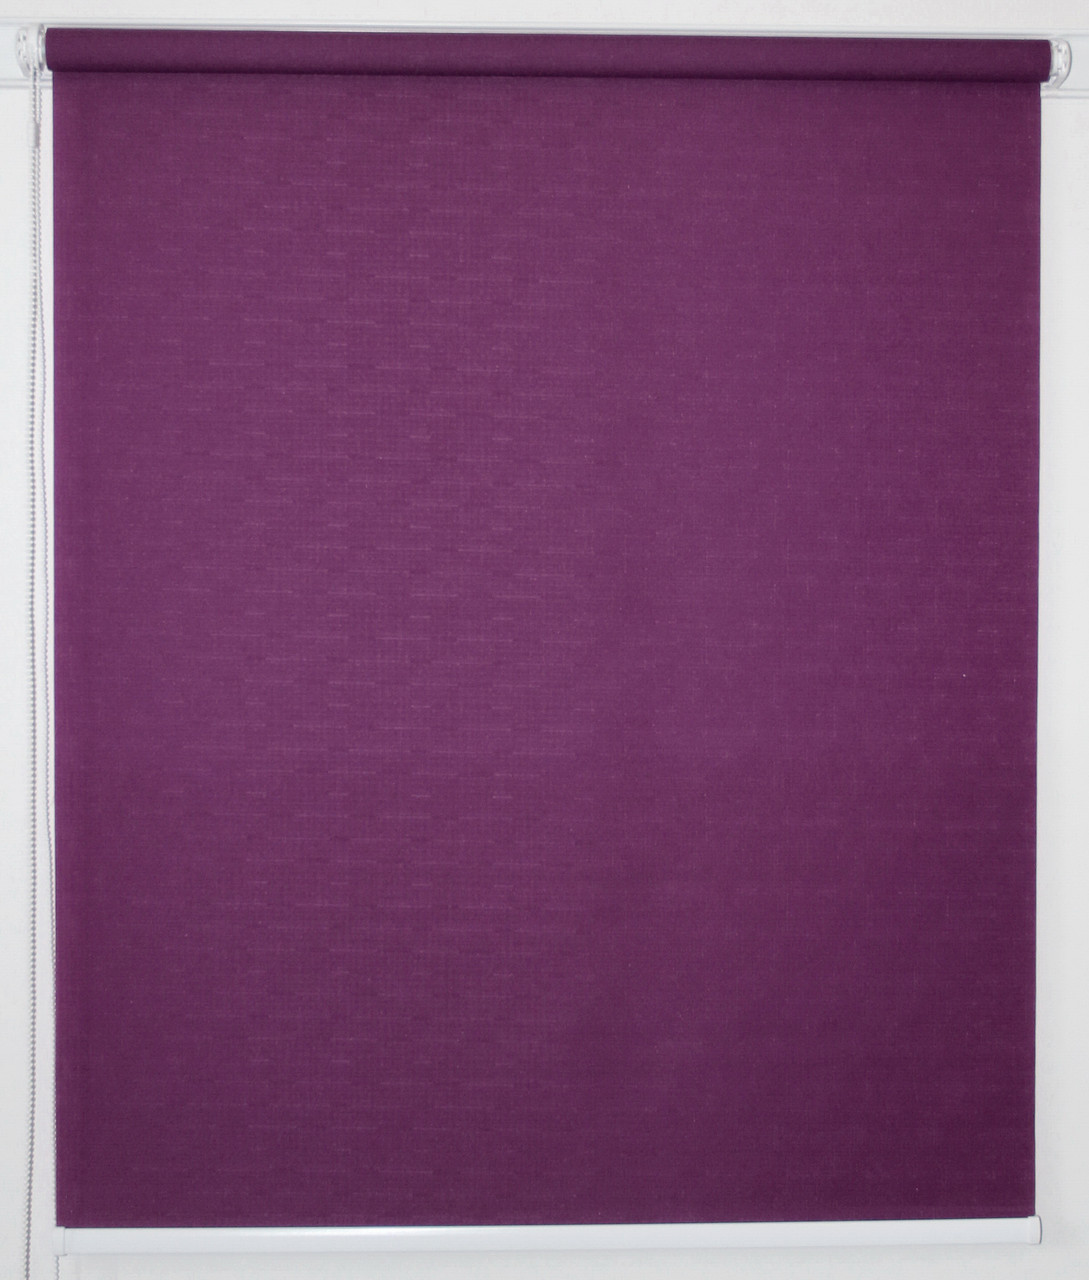 Рулонная штора 1050*1500 Лён 613 Фиолетовый